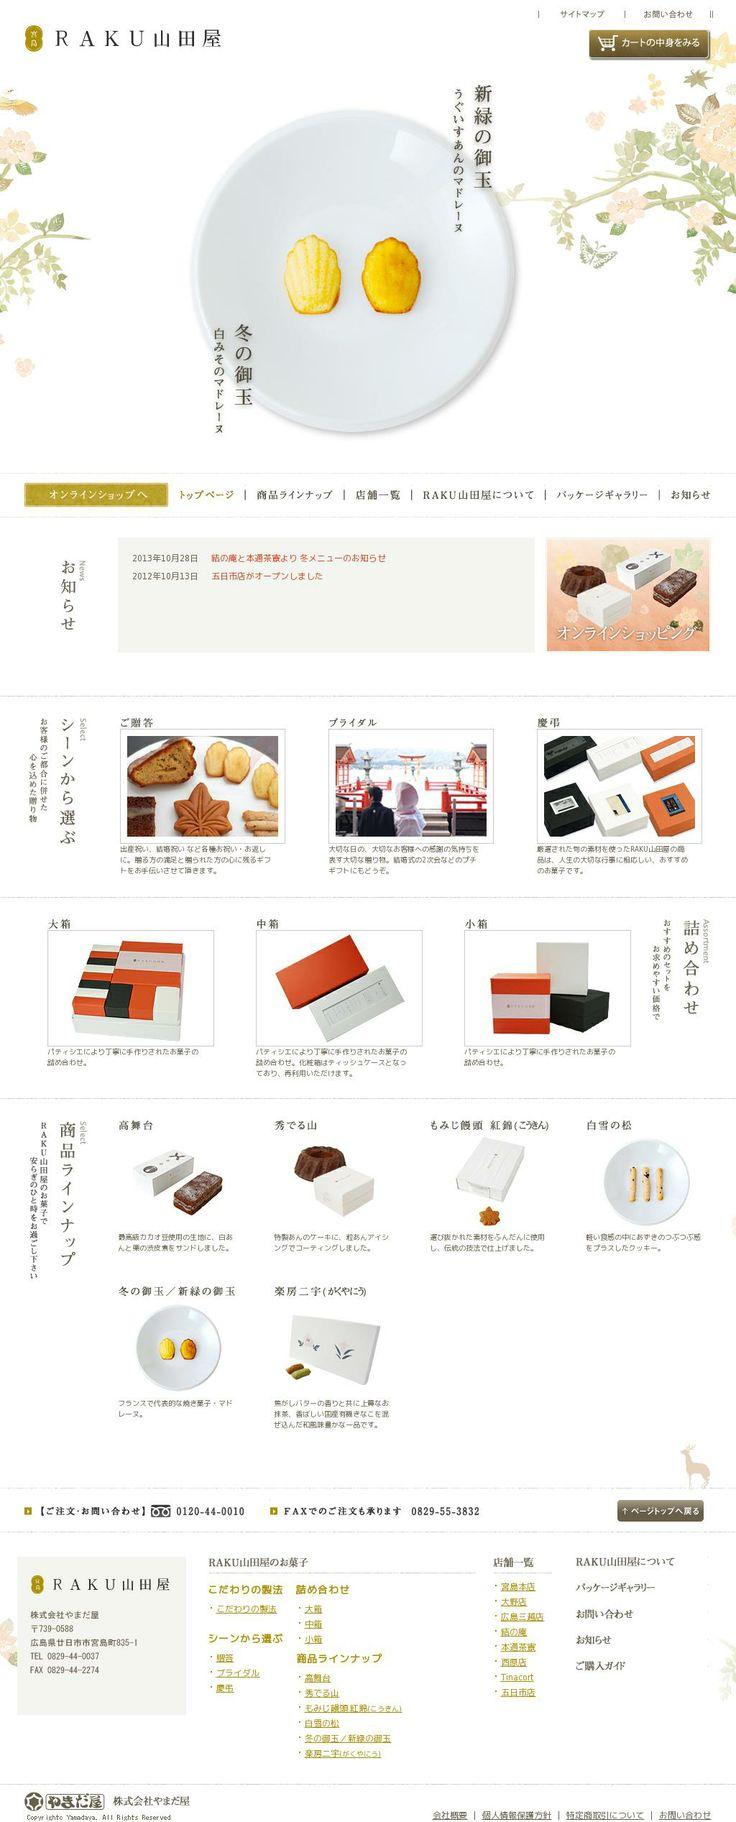 The website 'http://www.raku-yamadaya.jp/' courtesy of @Pinstamatic (http://pinstamatic.com)